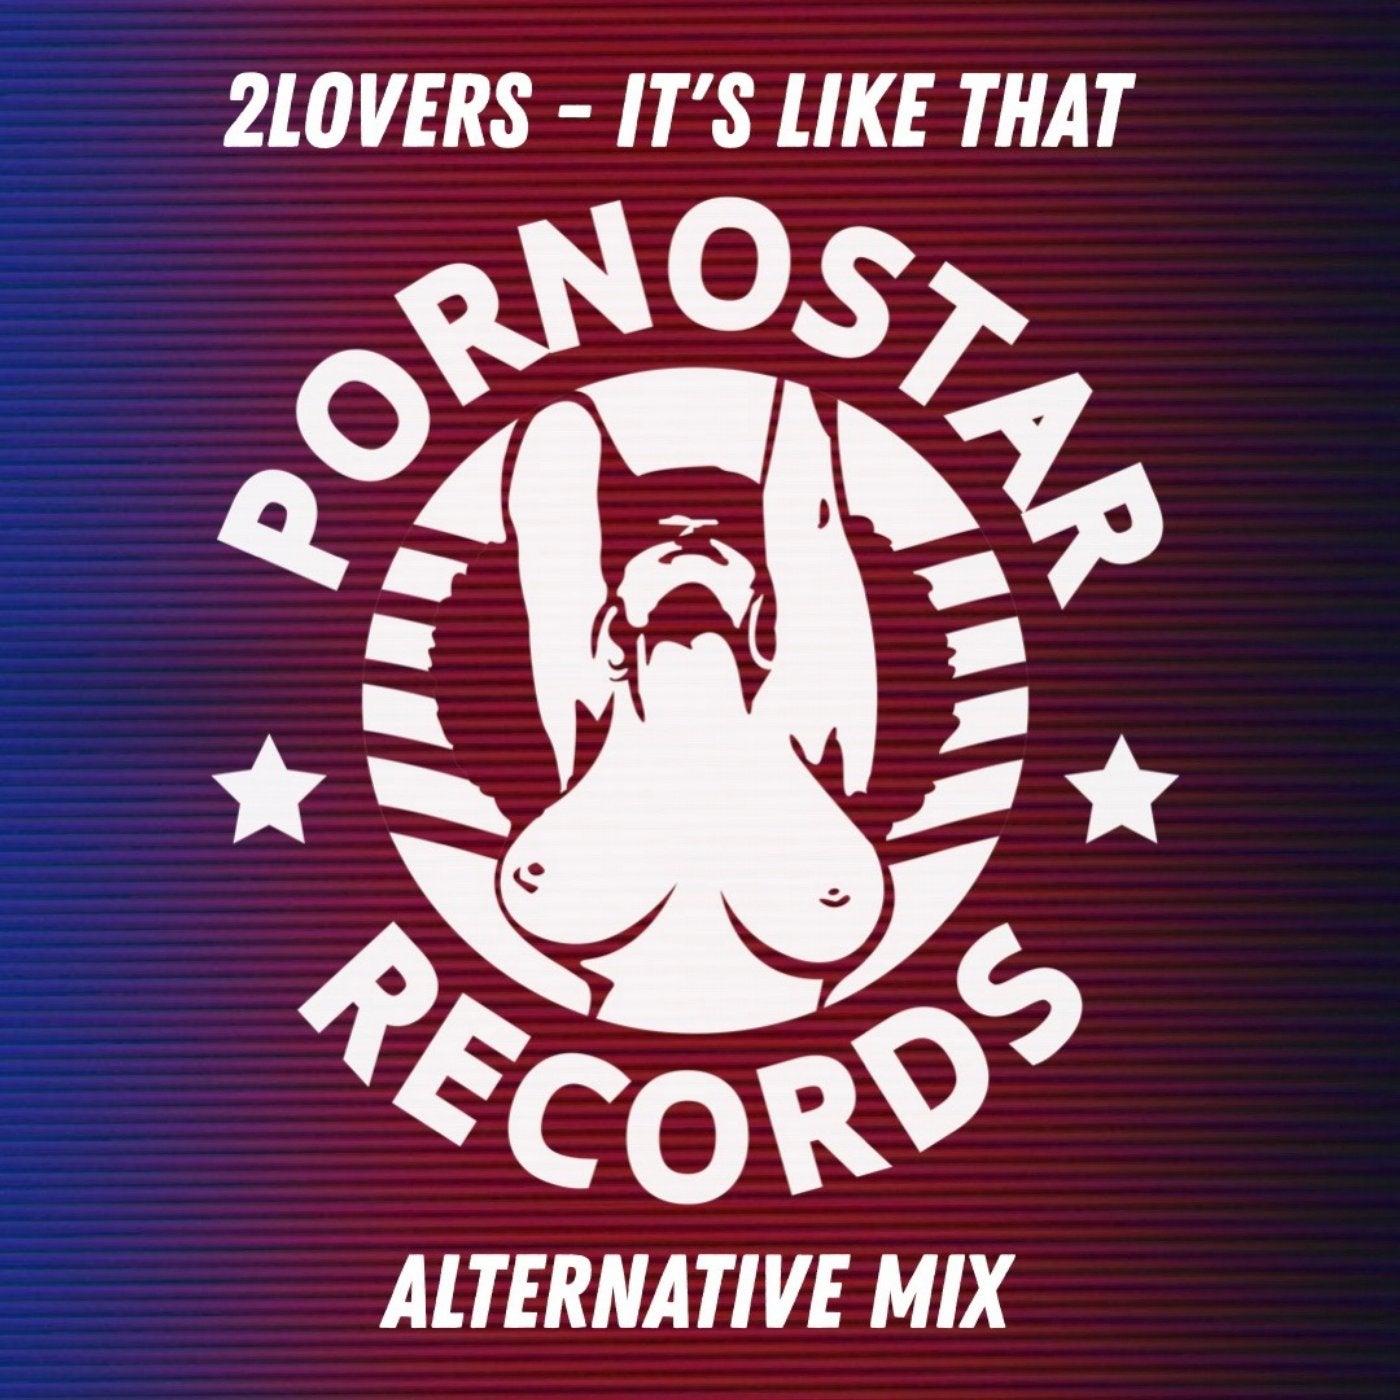 It's Like That (Alternative Mix)